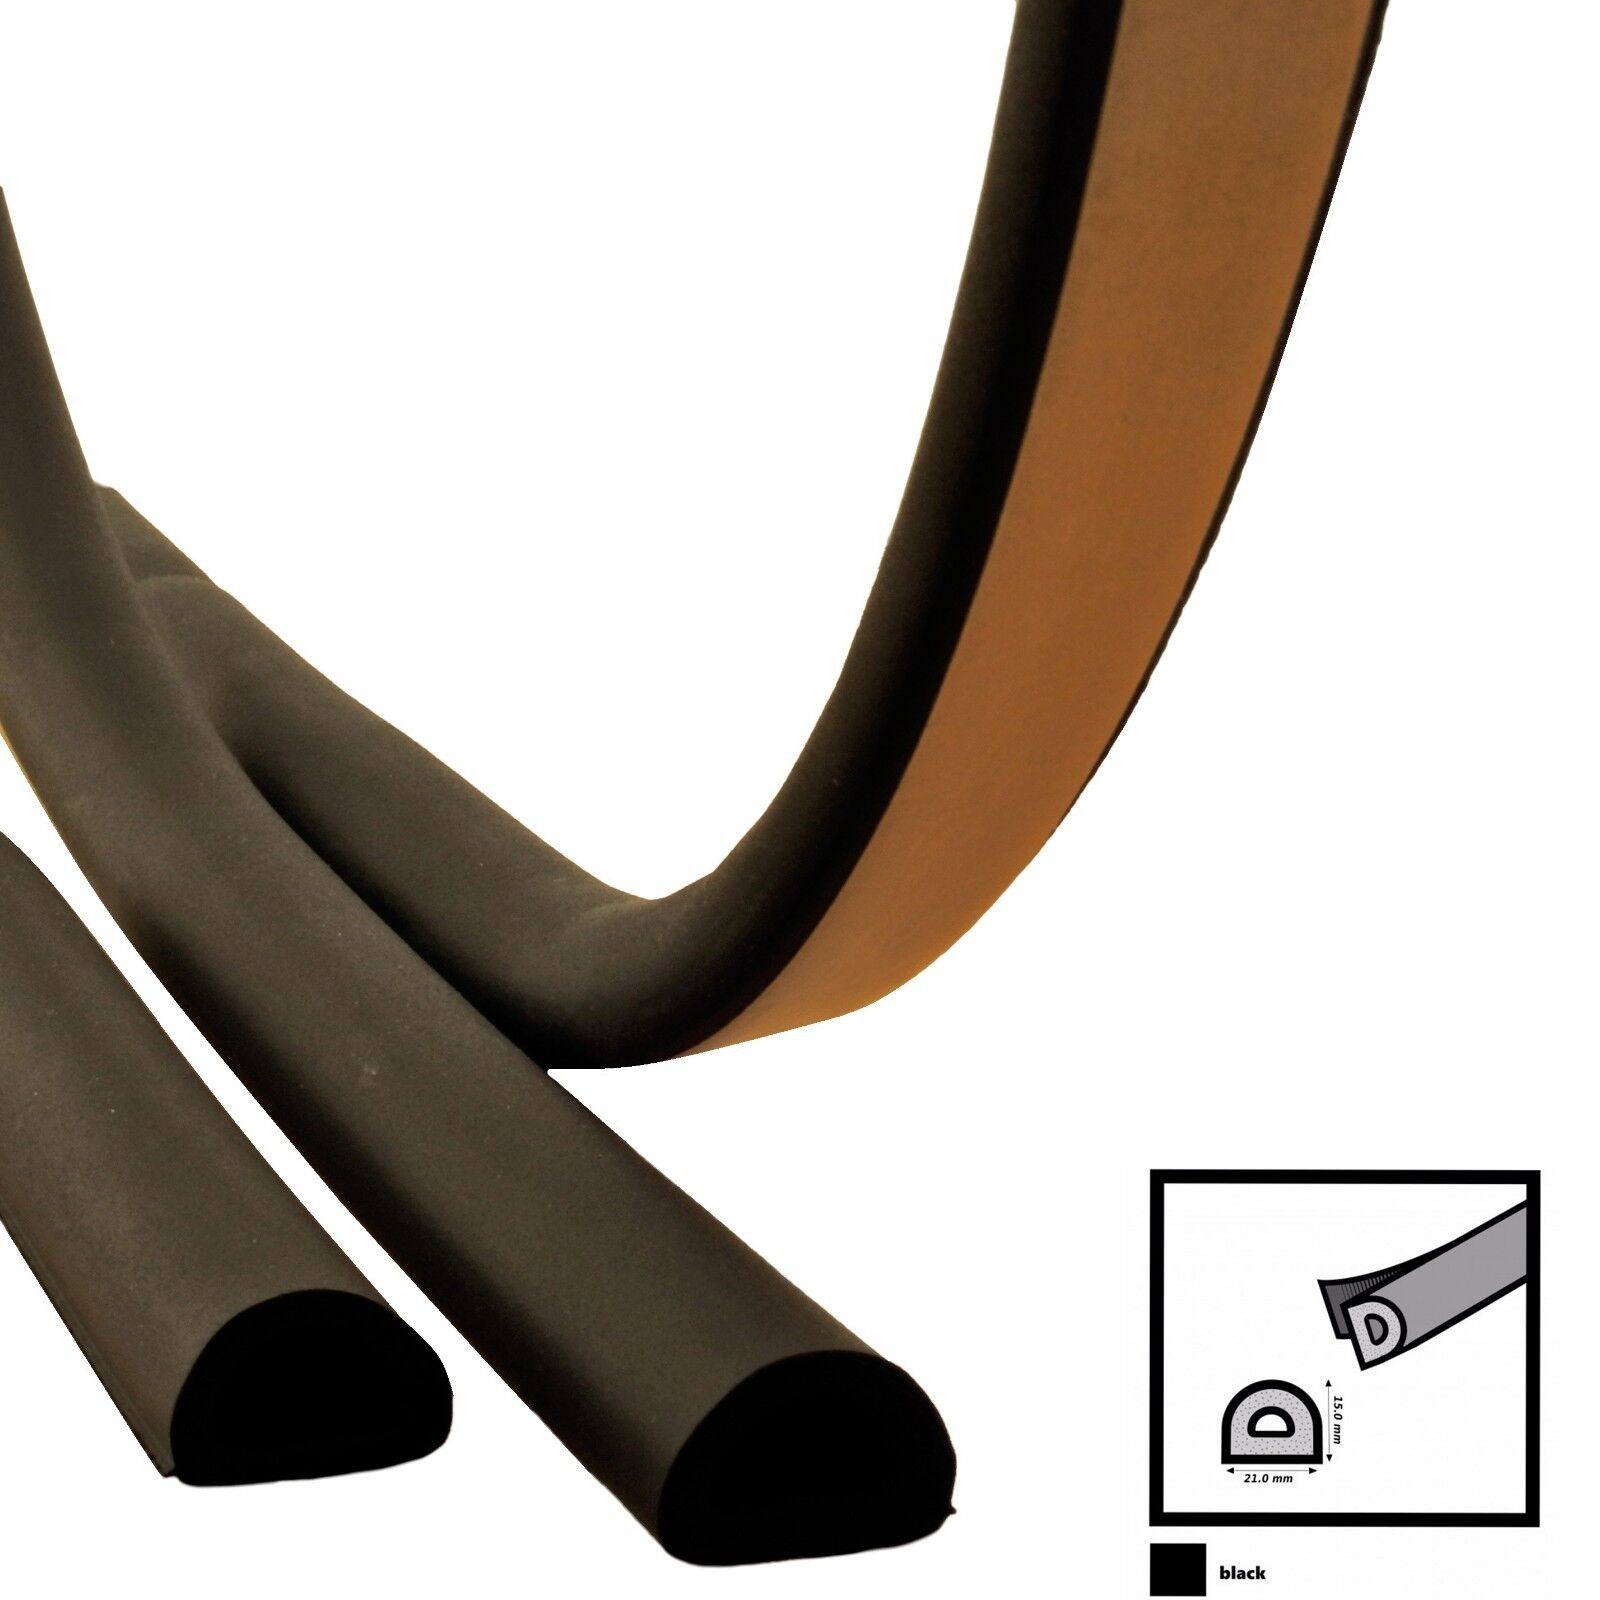 D D D 21mm x 15mm Fensterdichtung Türdichtung SELBSTKLEBEND EPDM schwarz | Geeignet für Farbe  e42577